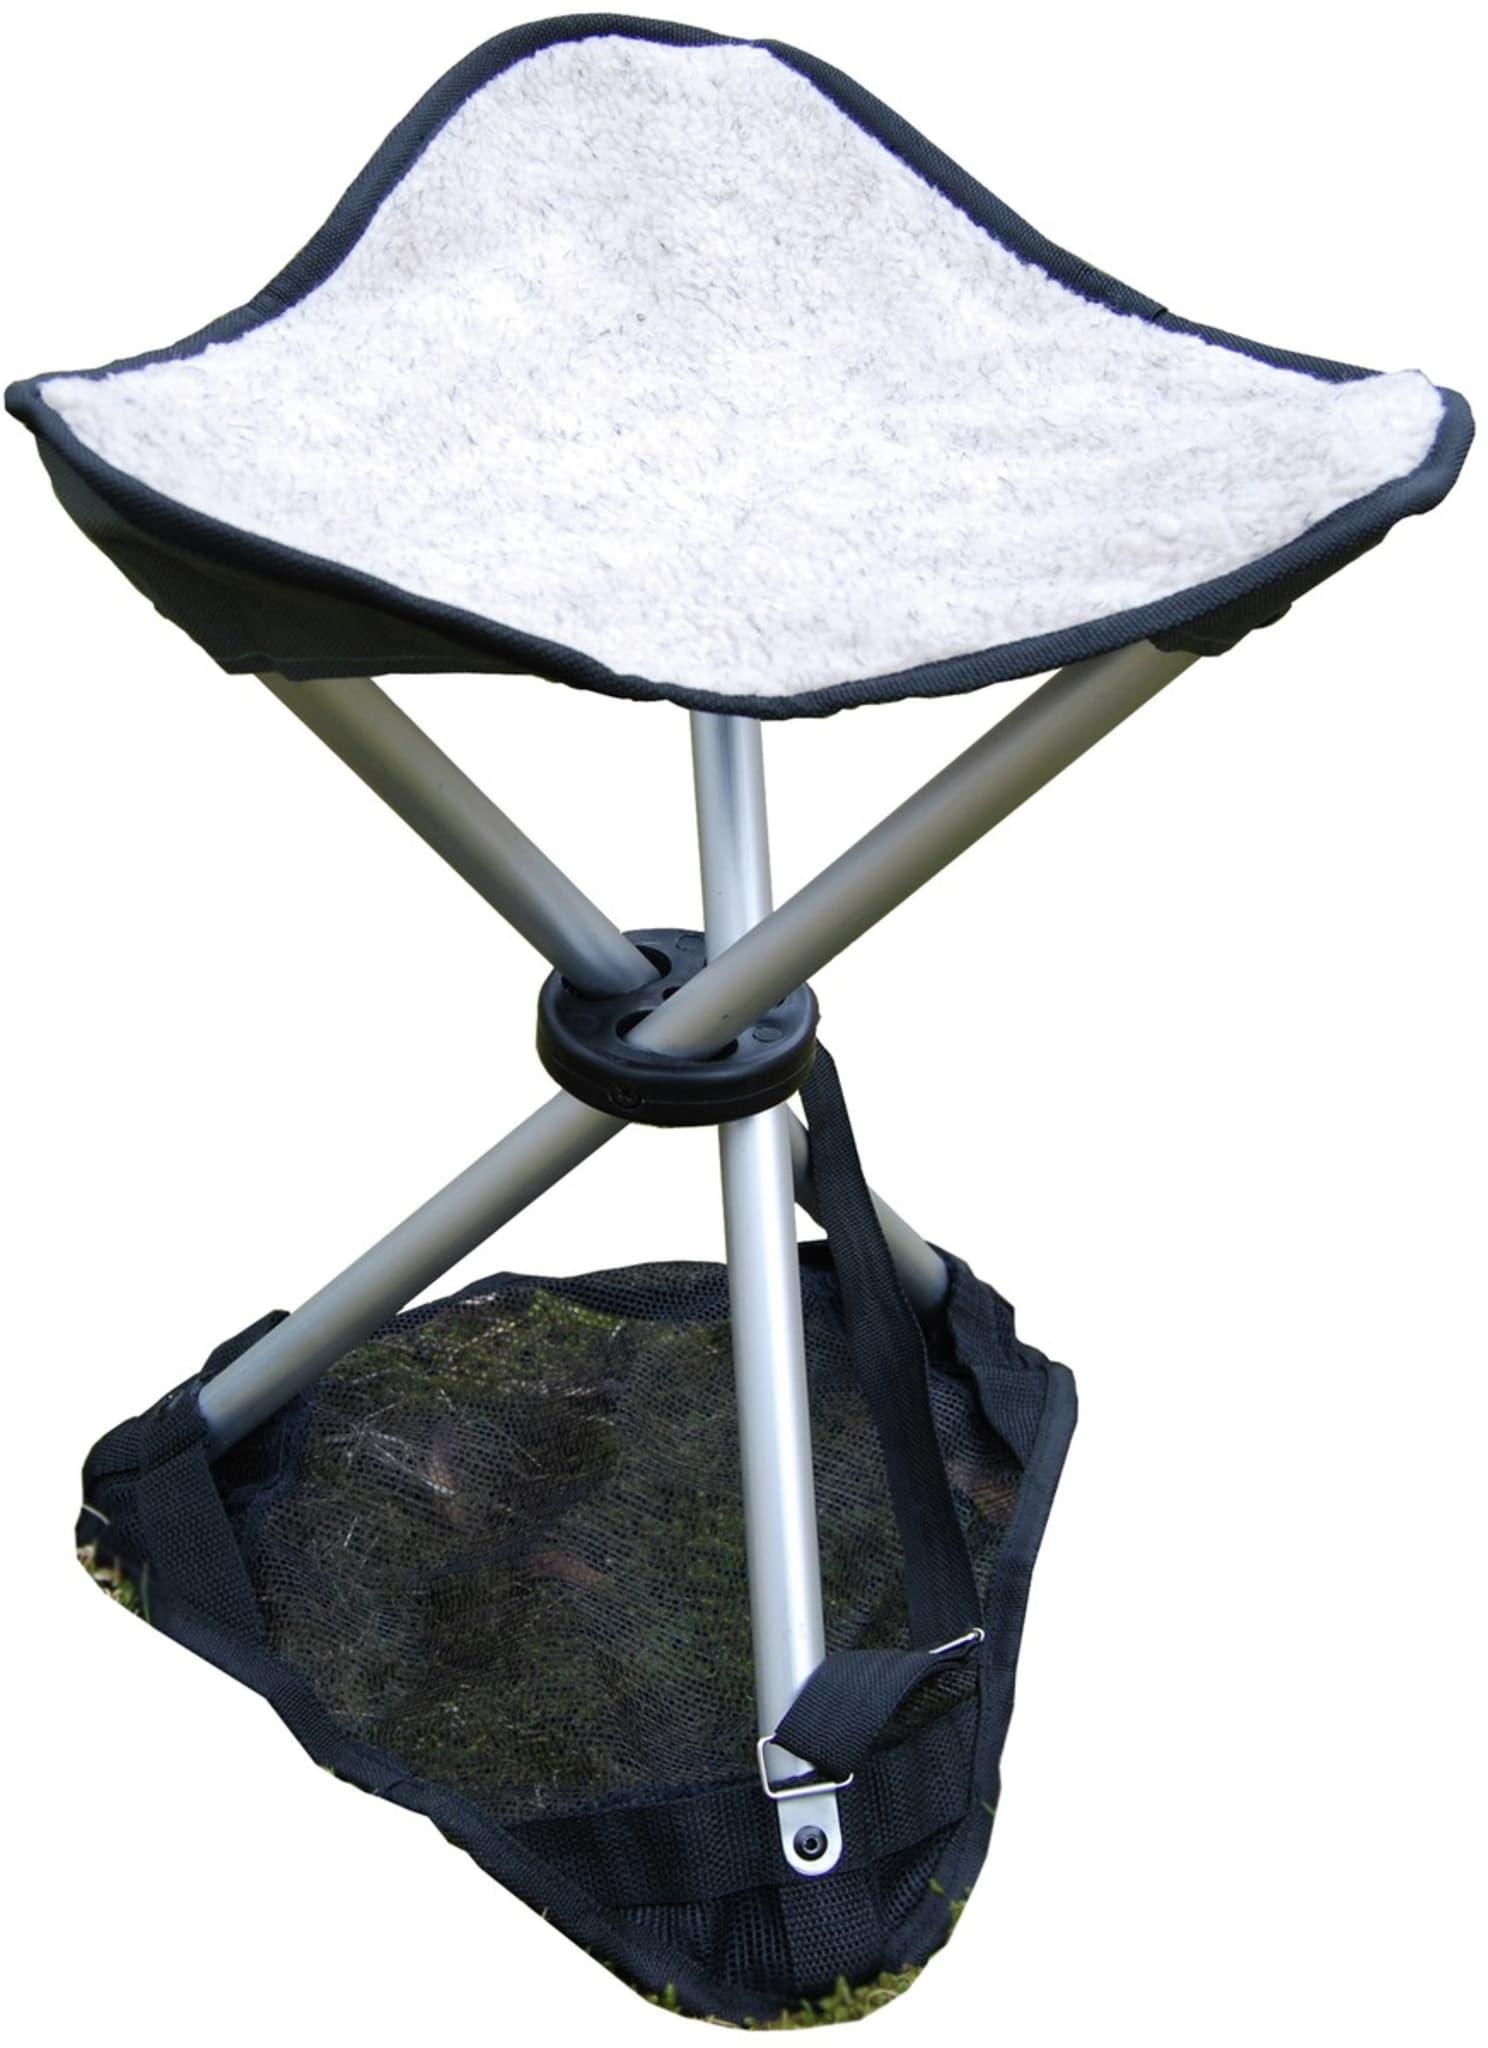 Turstol med varmt sete og integrert truge